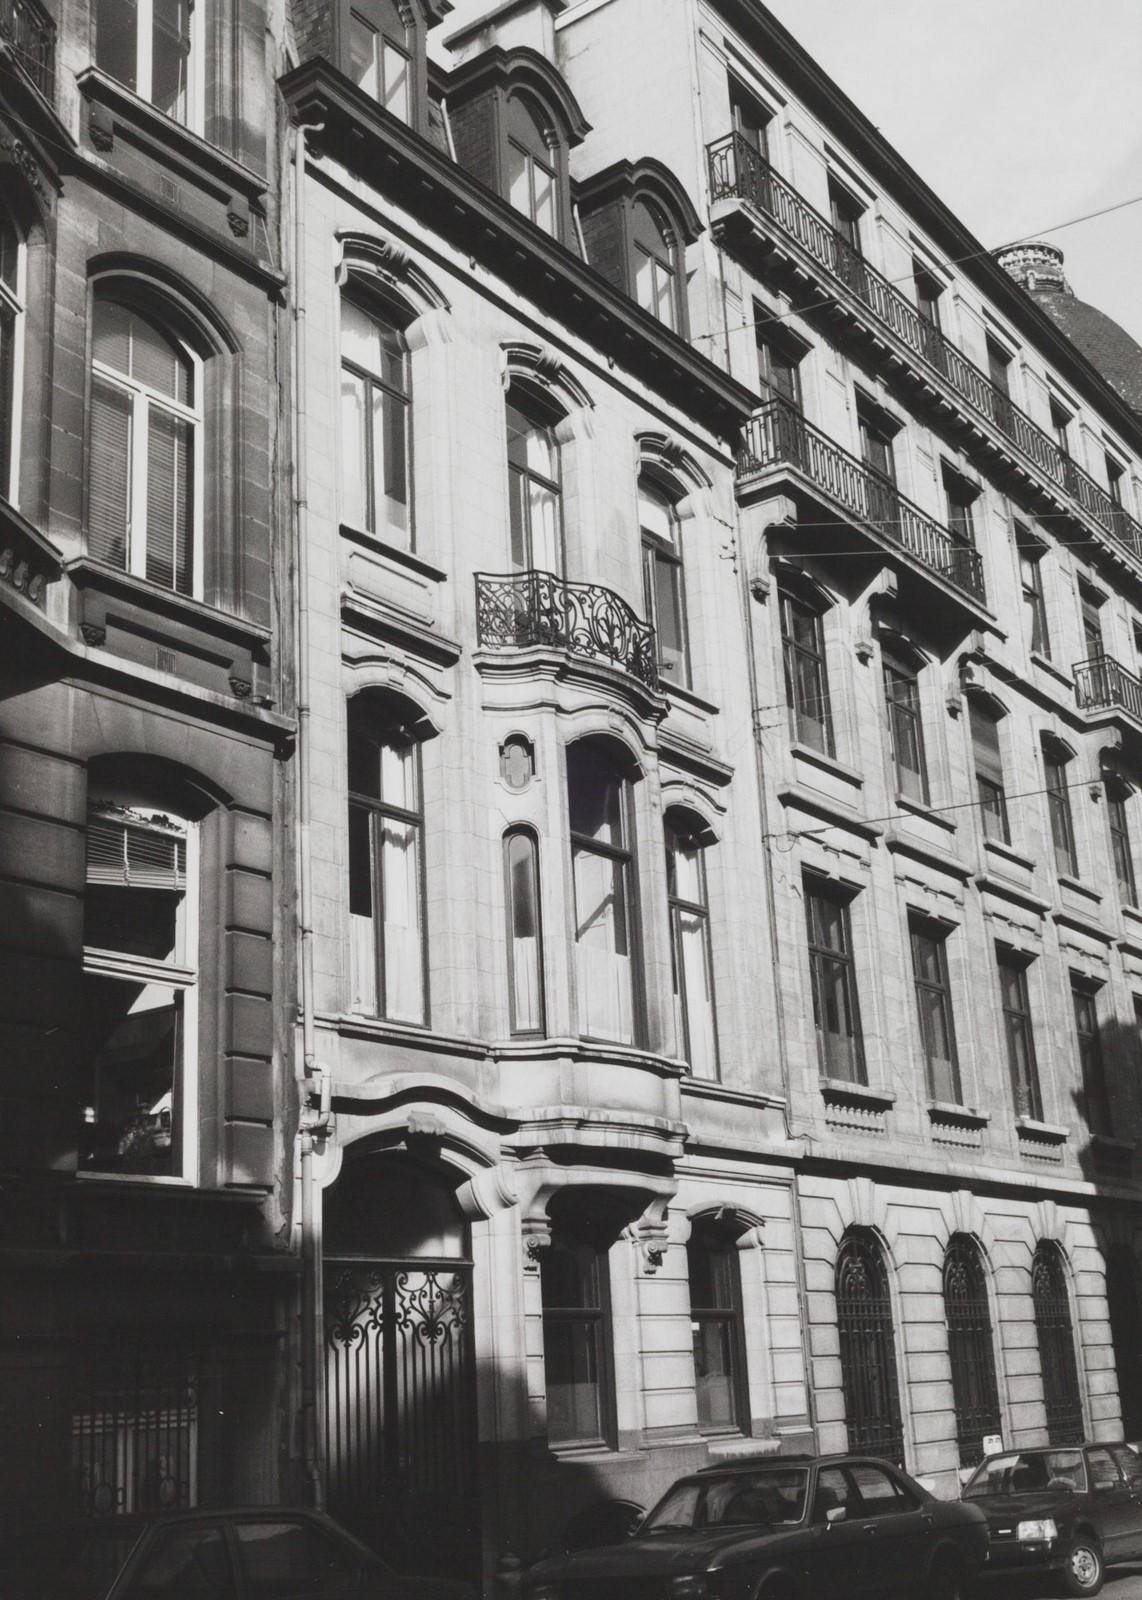 rue Van Orley 12., 1985